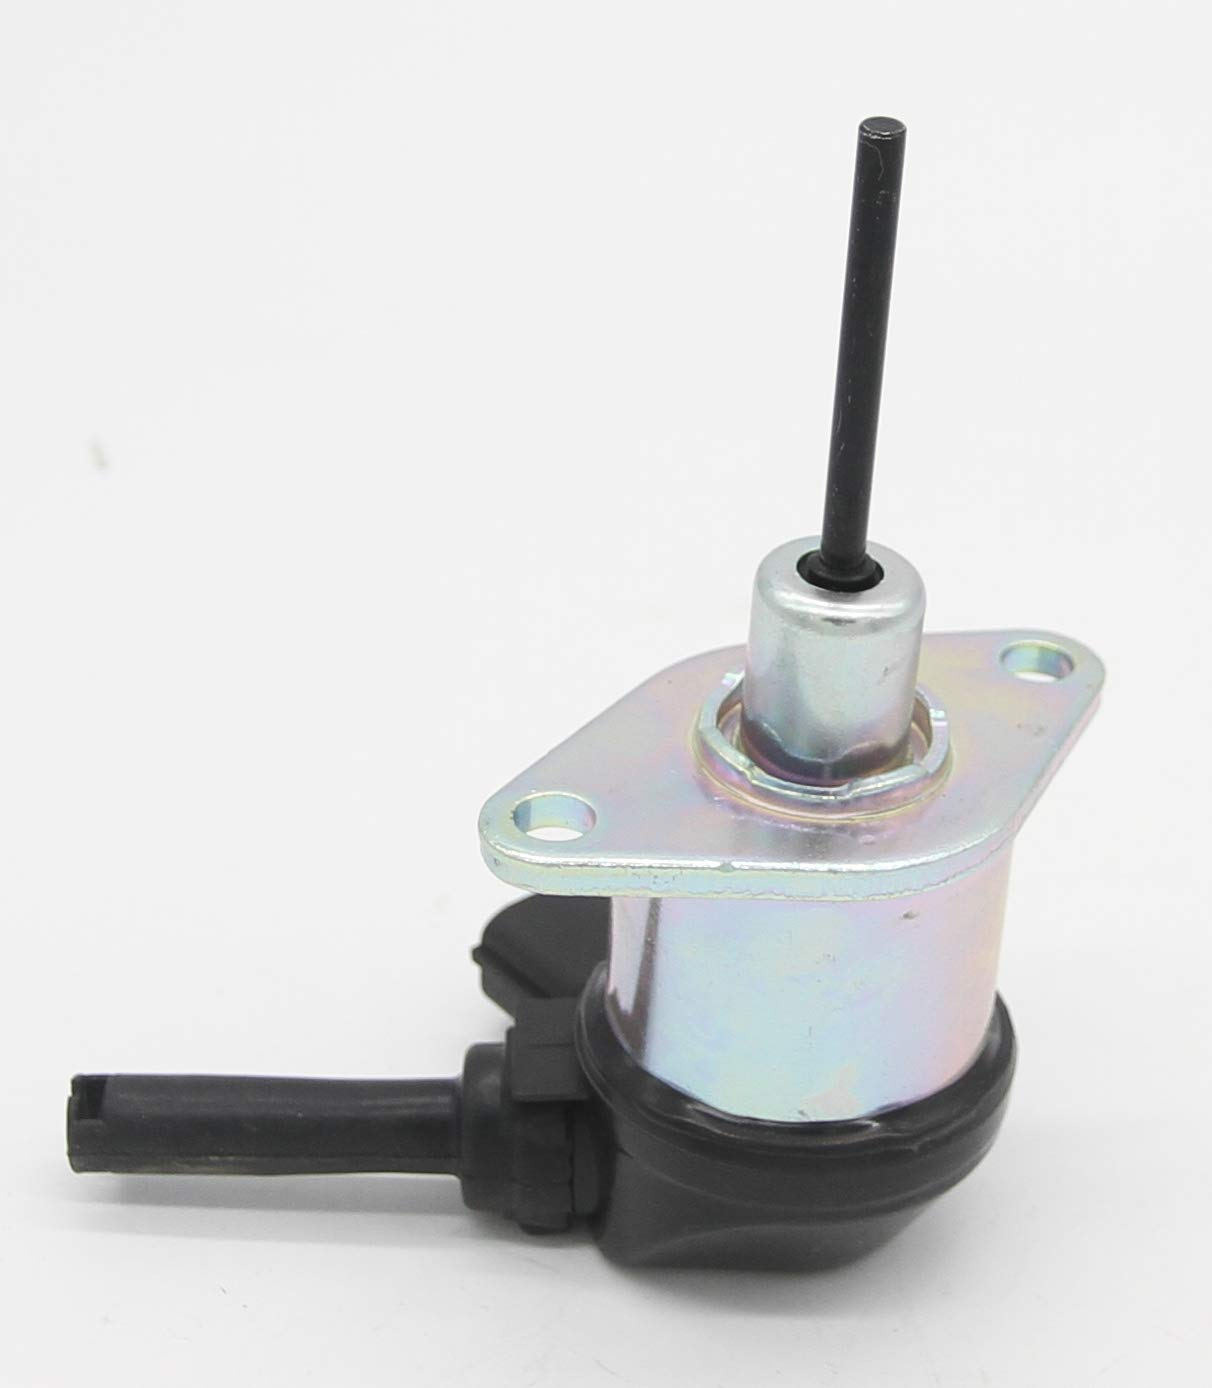 Hong Hui 1A021-60017 1A021-60010 1A021-60015 Stop Solenoid Valve 12 Volt Replacement for Kubota V2203 V2403-M Bobcat AL275 S205 Schaffer 3350 Fuel Shut Off